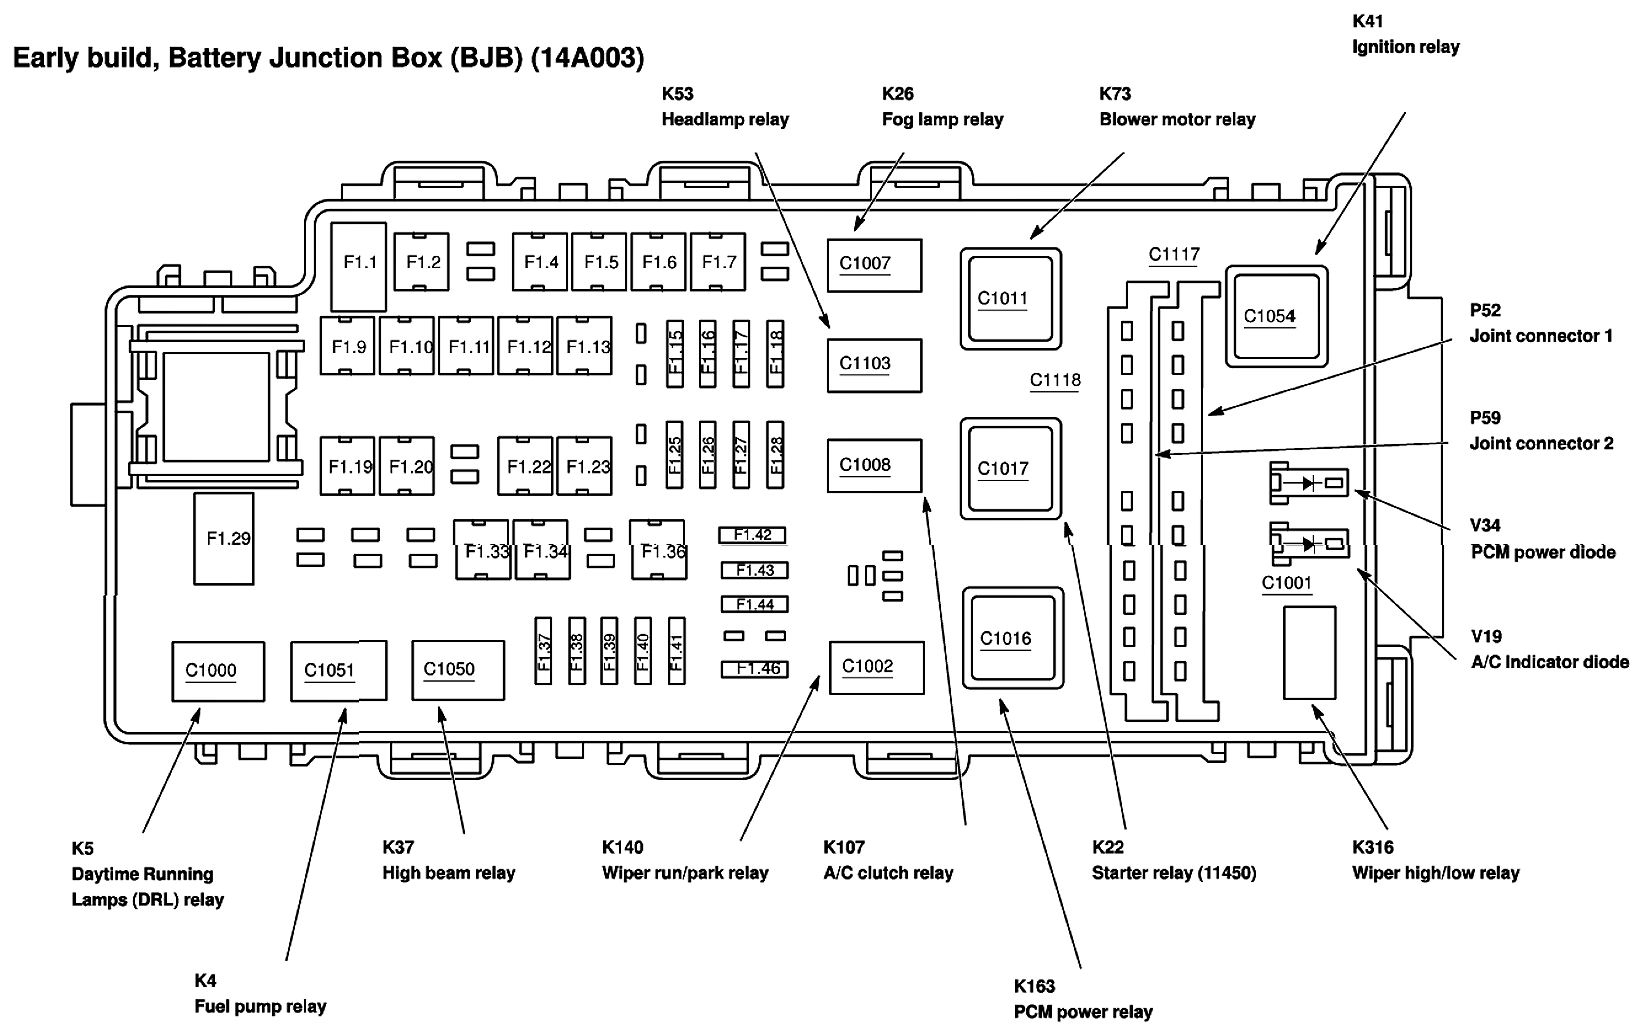 2004 Explorer Fuse Box - Wiring Diagrams Hubs - 2002 Ford Explorer Wiring Diagram